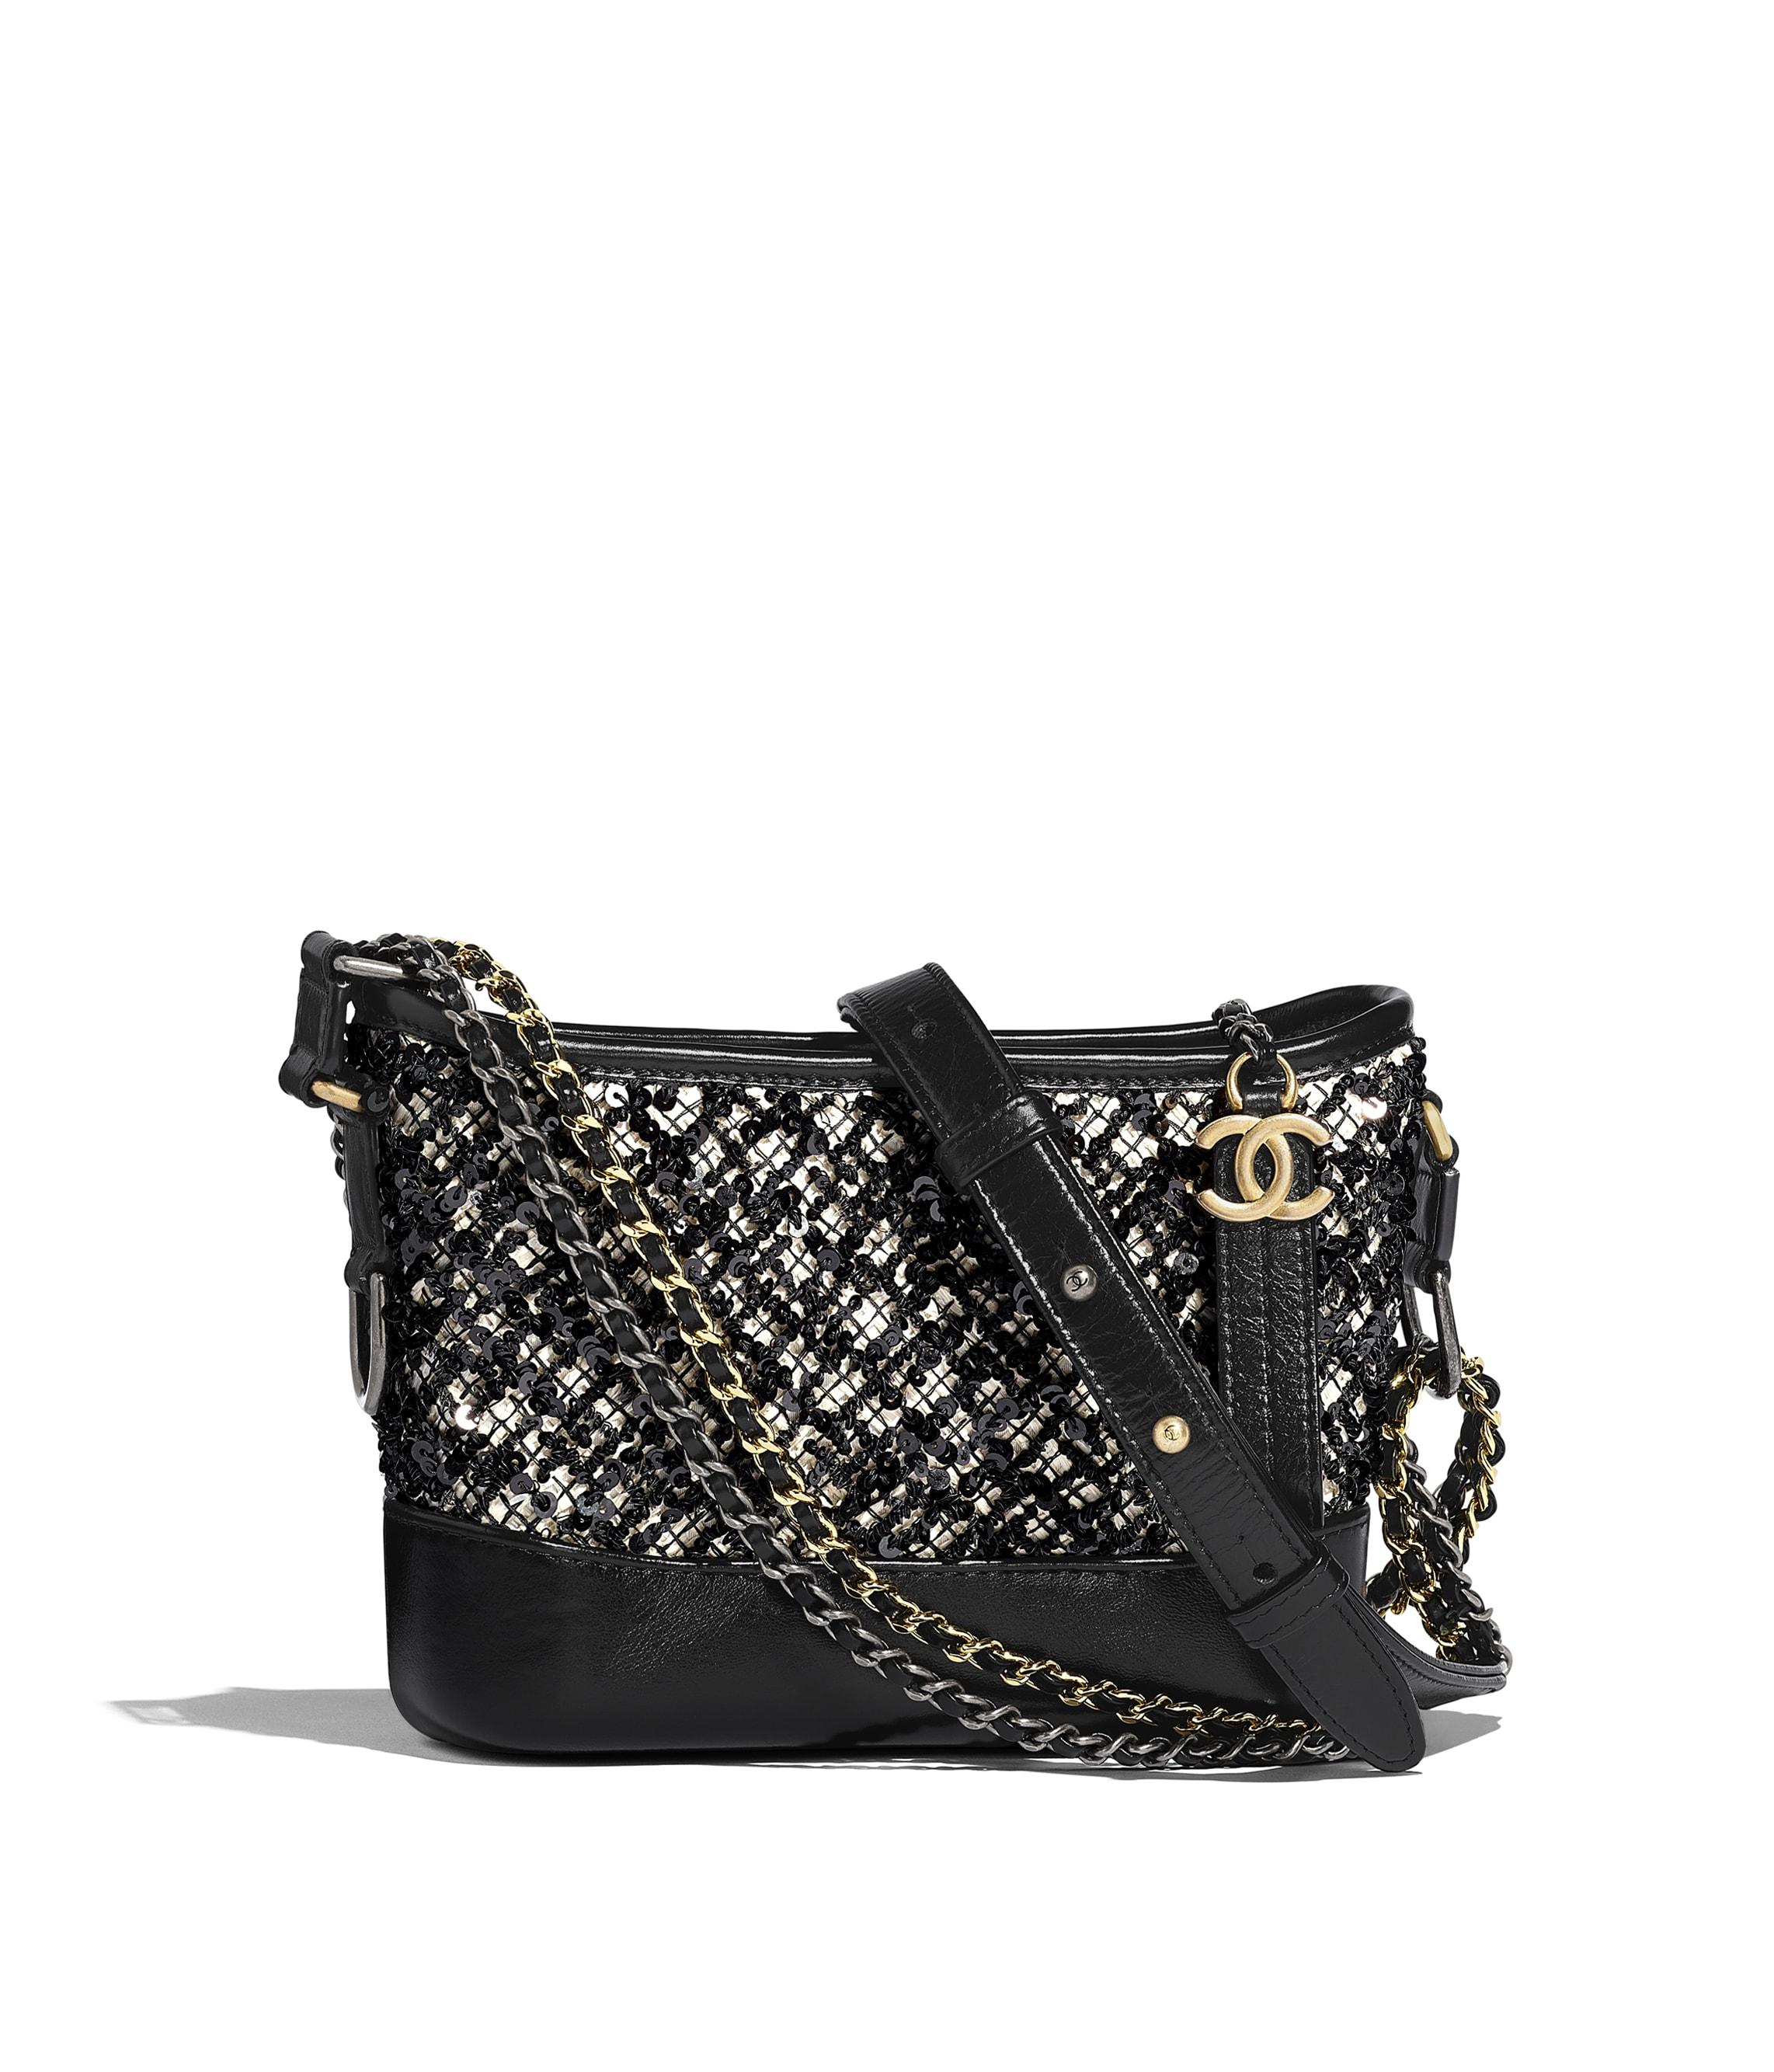 b5d74107968f CHANEL's GABRIELLE - Handbags - CHANEL